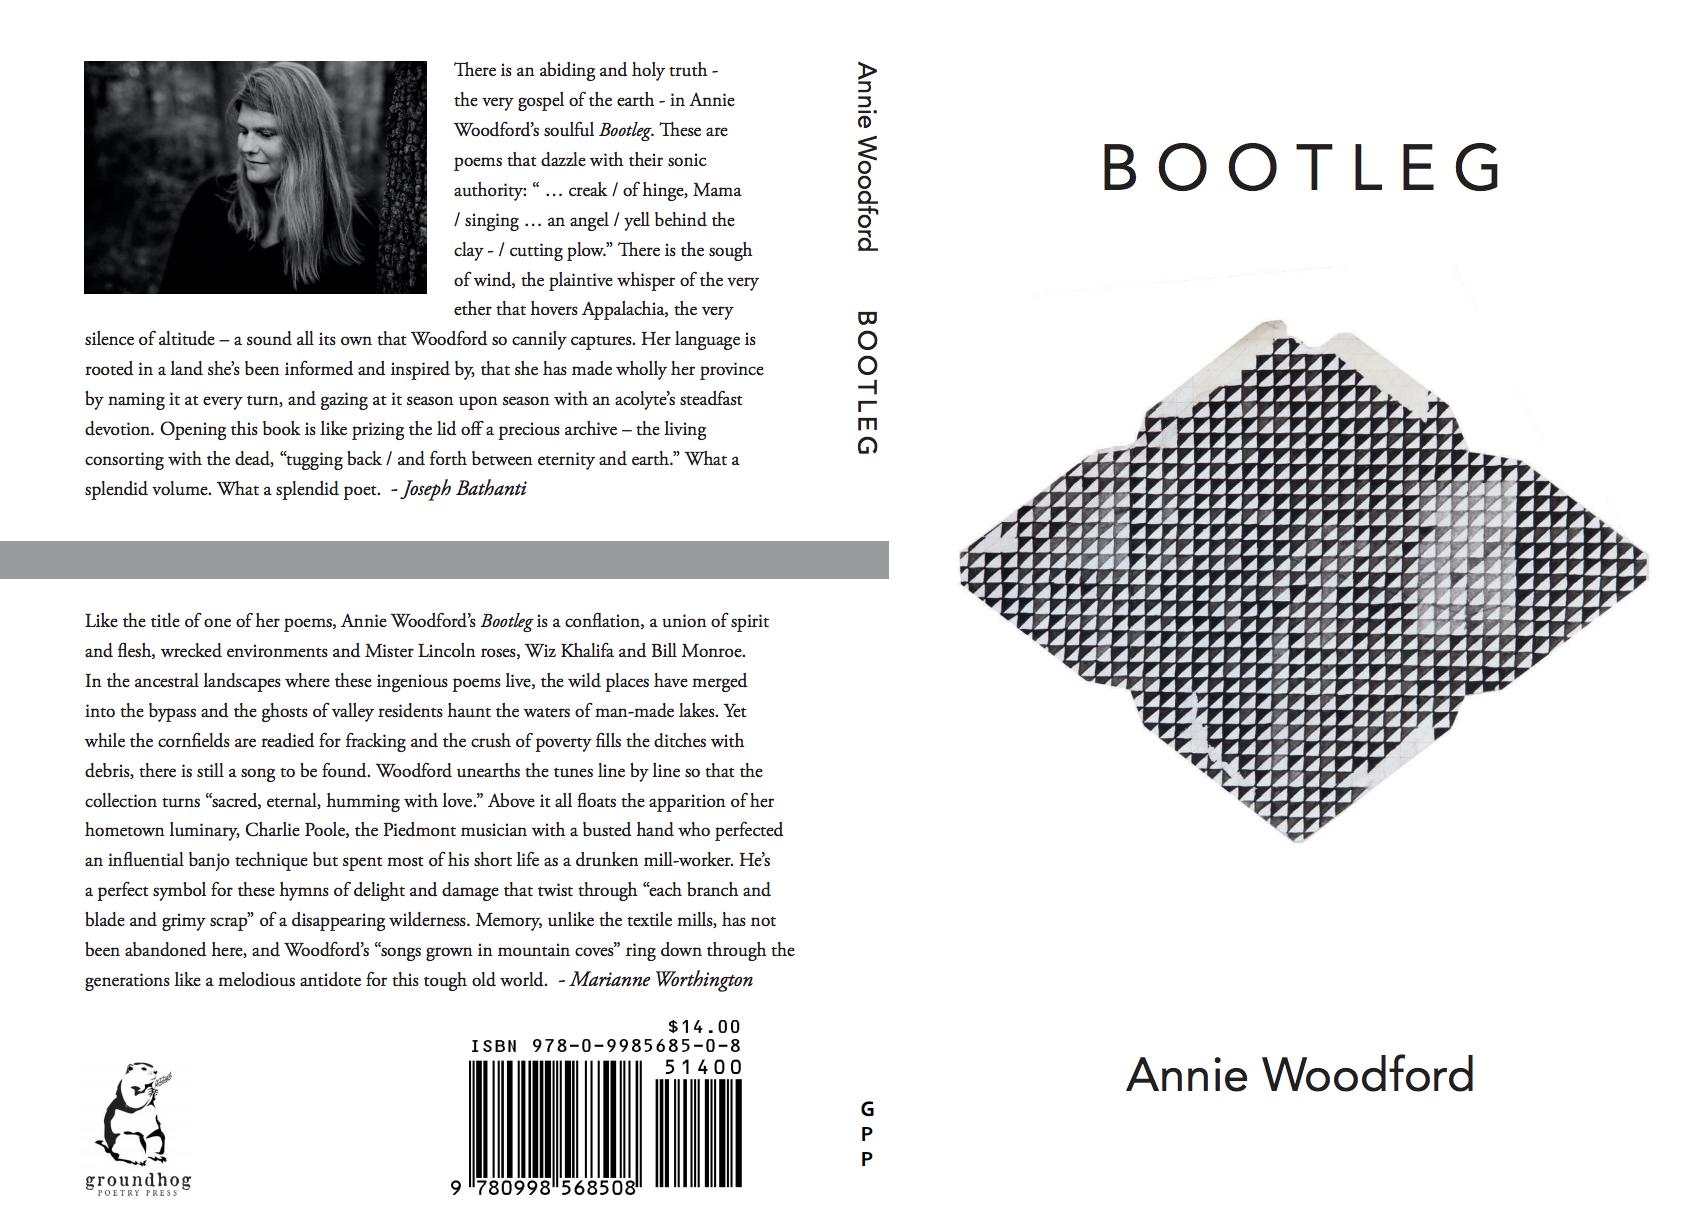 Bootleg Cover